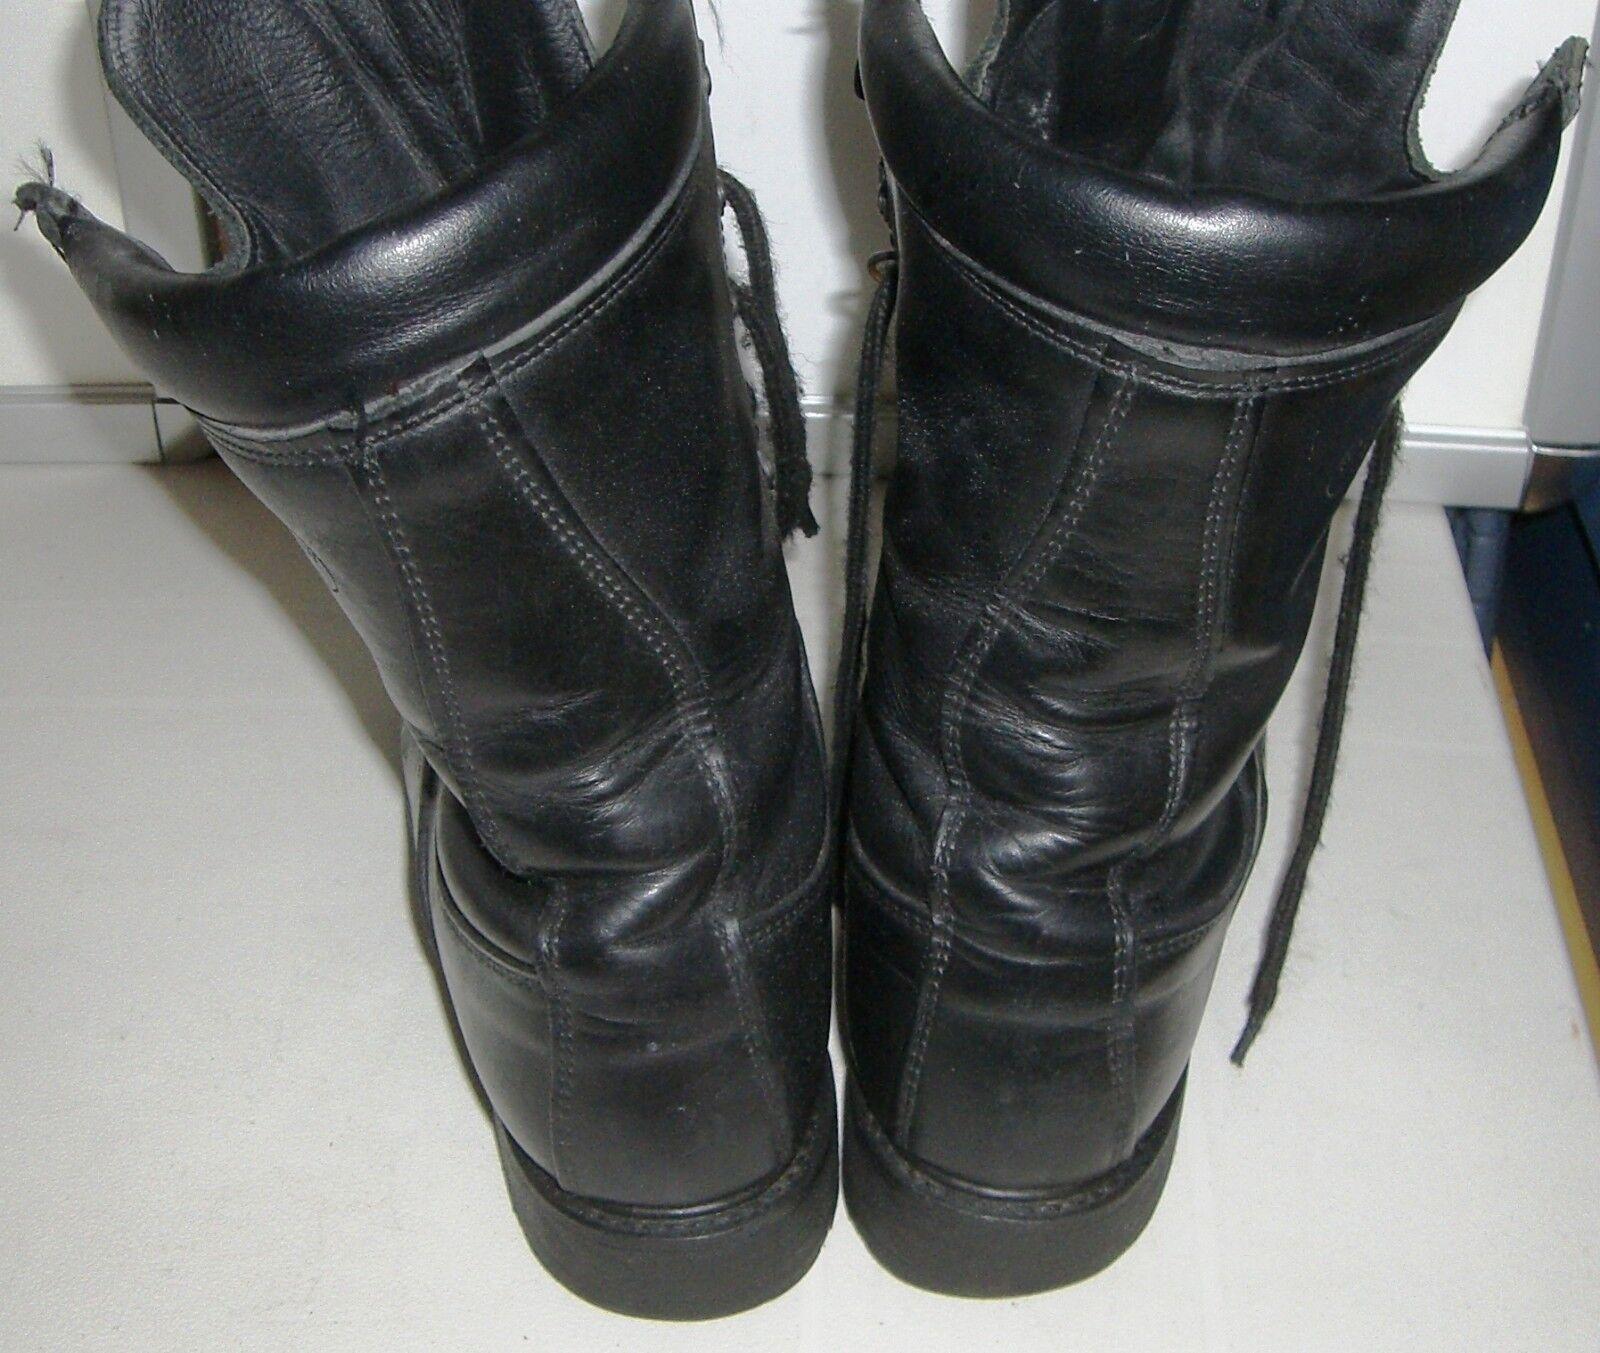 US-Army-/Biker-Stiefel Matterhorn Gr. 8 1/2 Leder (ca. 41,5), Goretex Winter-Stiefel Leder 1/2 2b839f